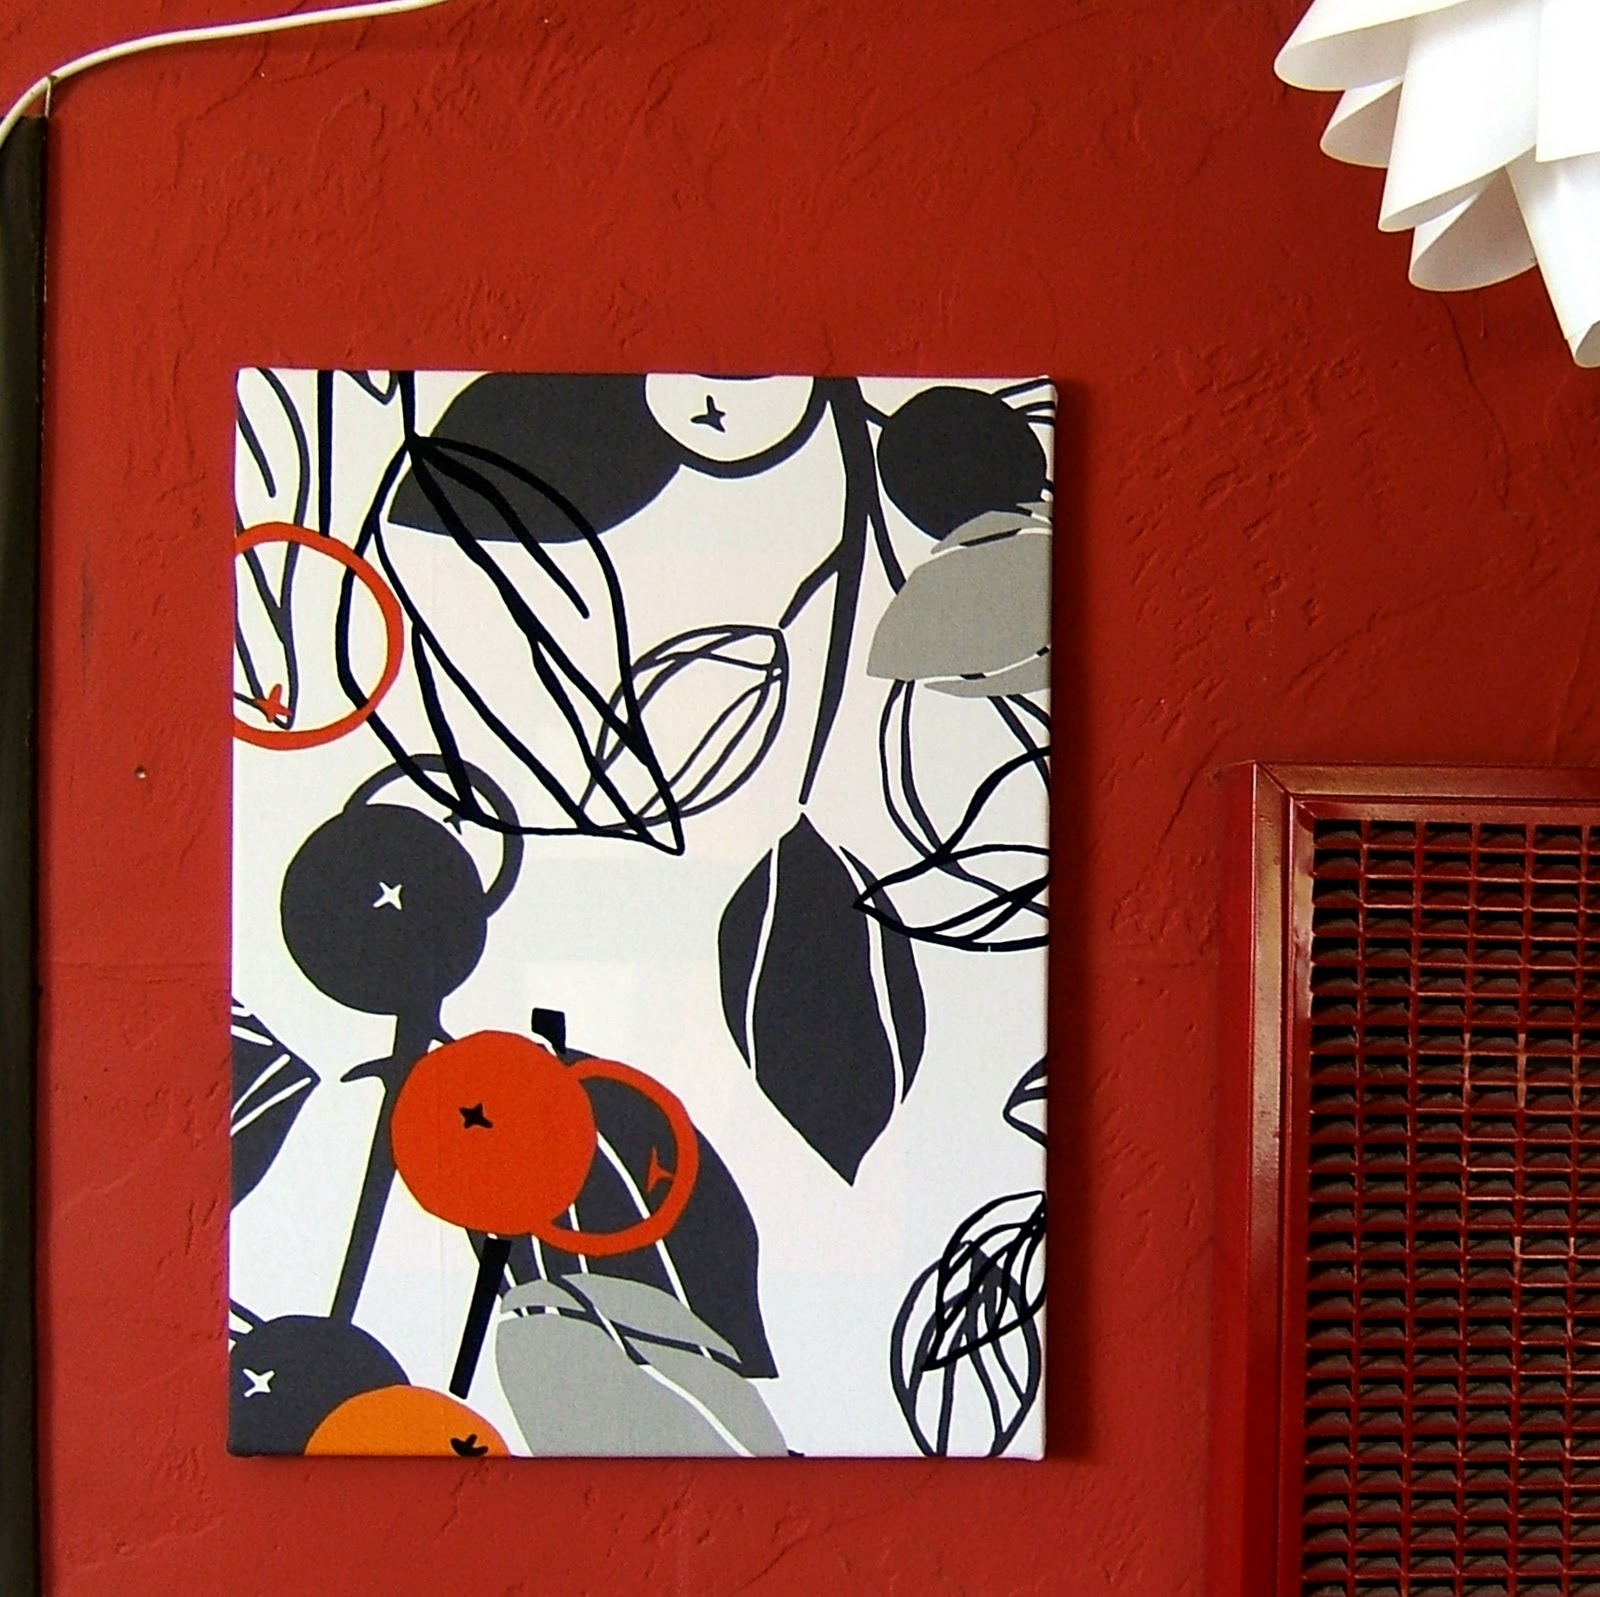 Nine Red: Fabric Wall Art Tutorial Regarding Recent Red Fabric Wall Art (View 11 of 15)